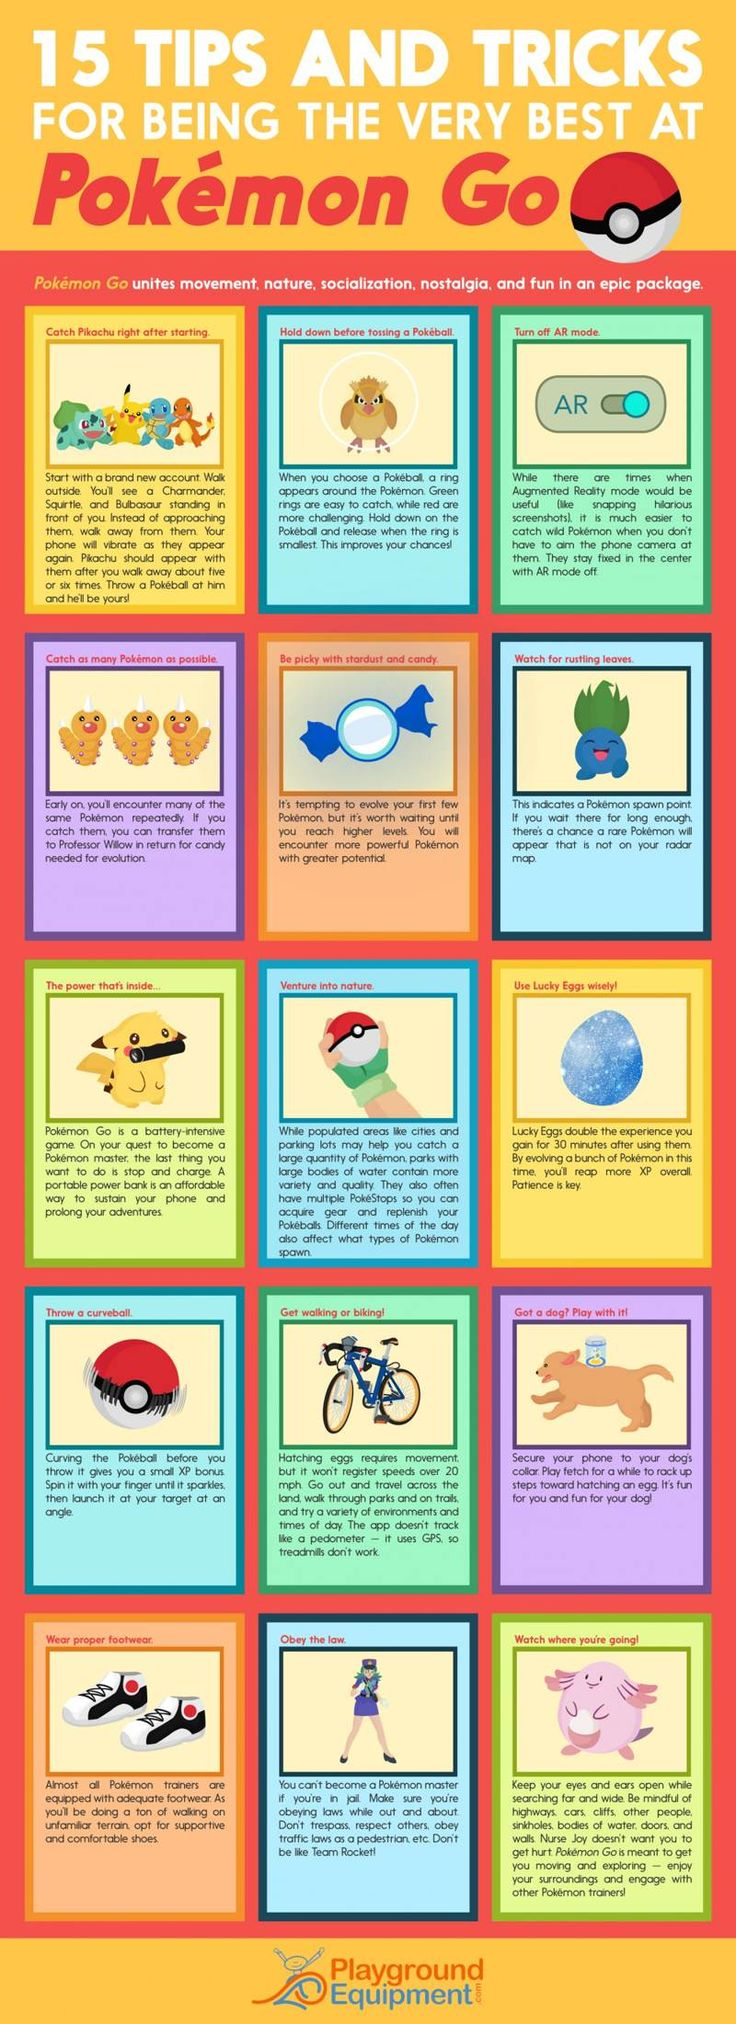 Handy Pokemon Go tips - http://www.popularaz.com/handy-pokemon-go-tips/